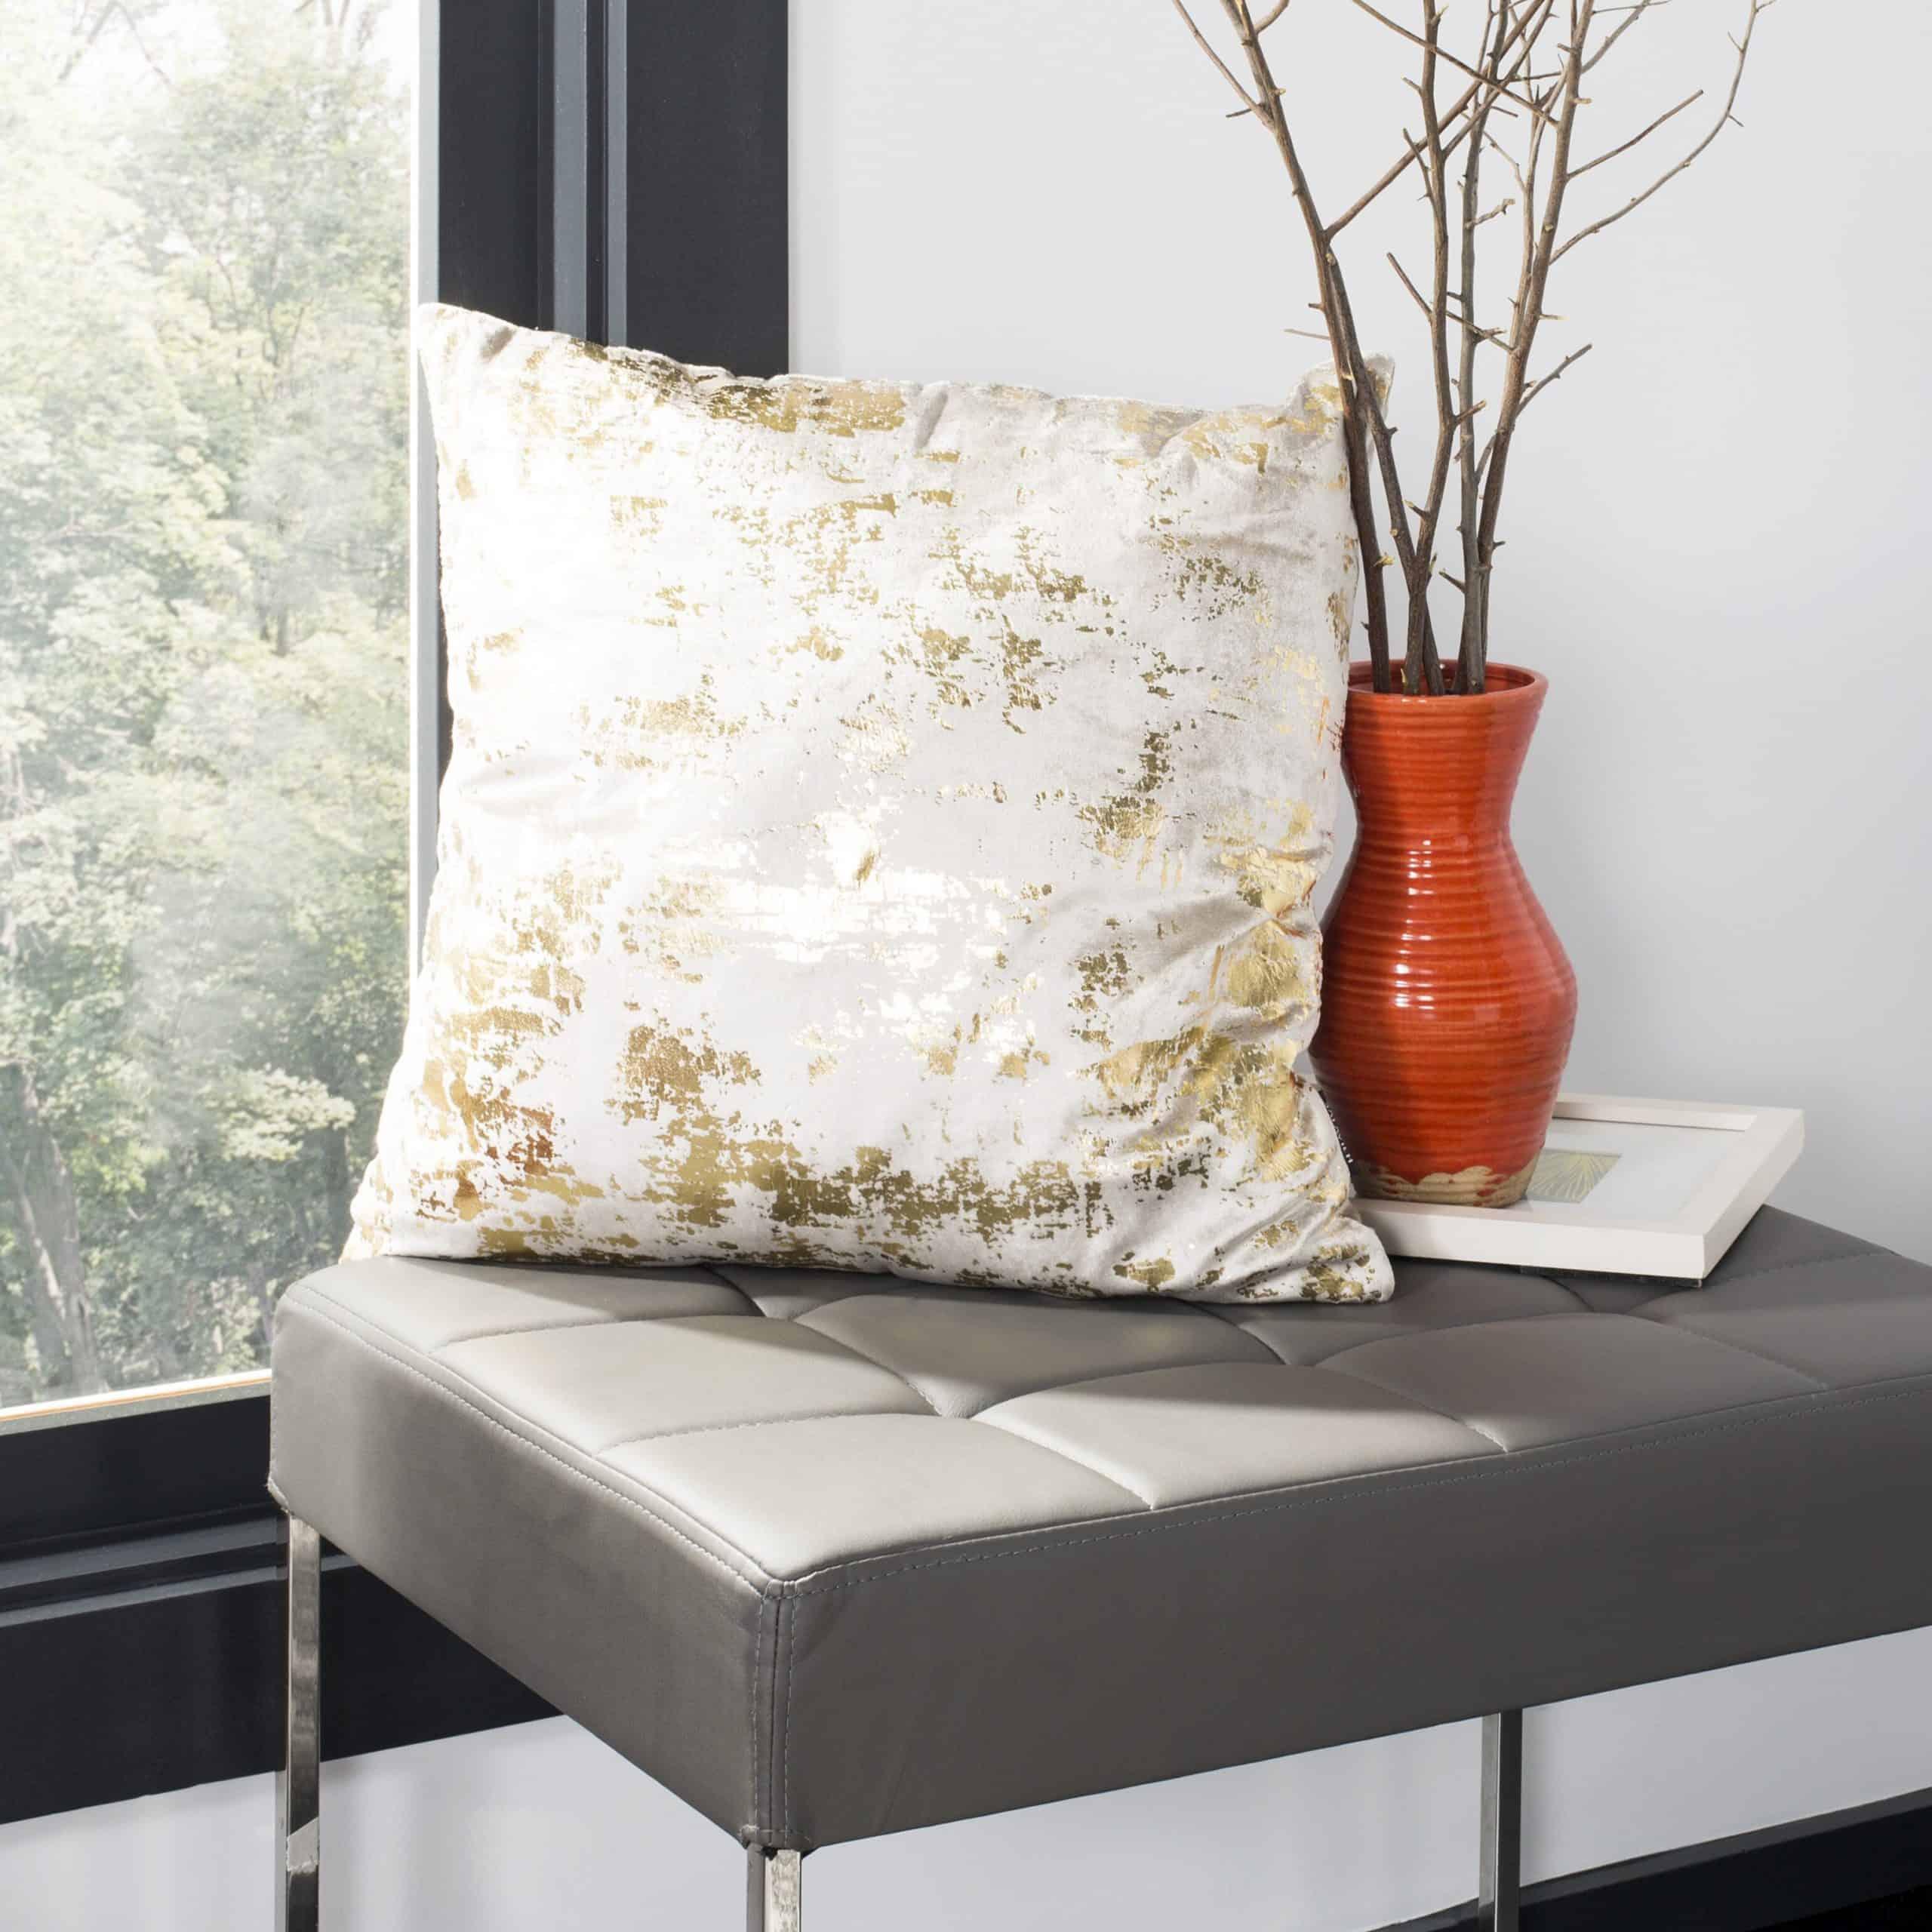 Add a Comfy Couch Cushion